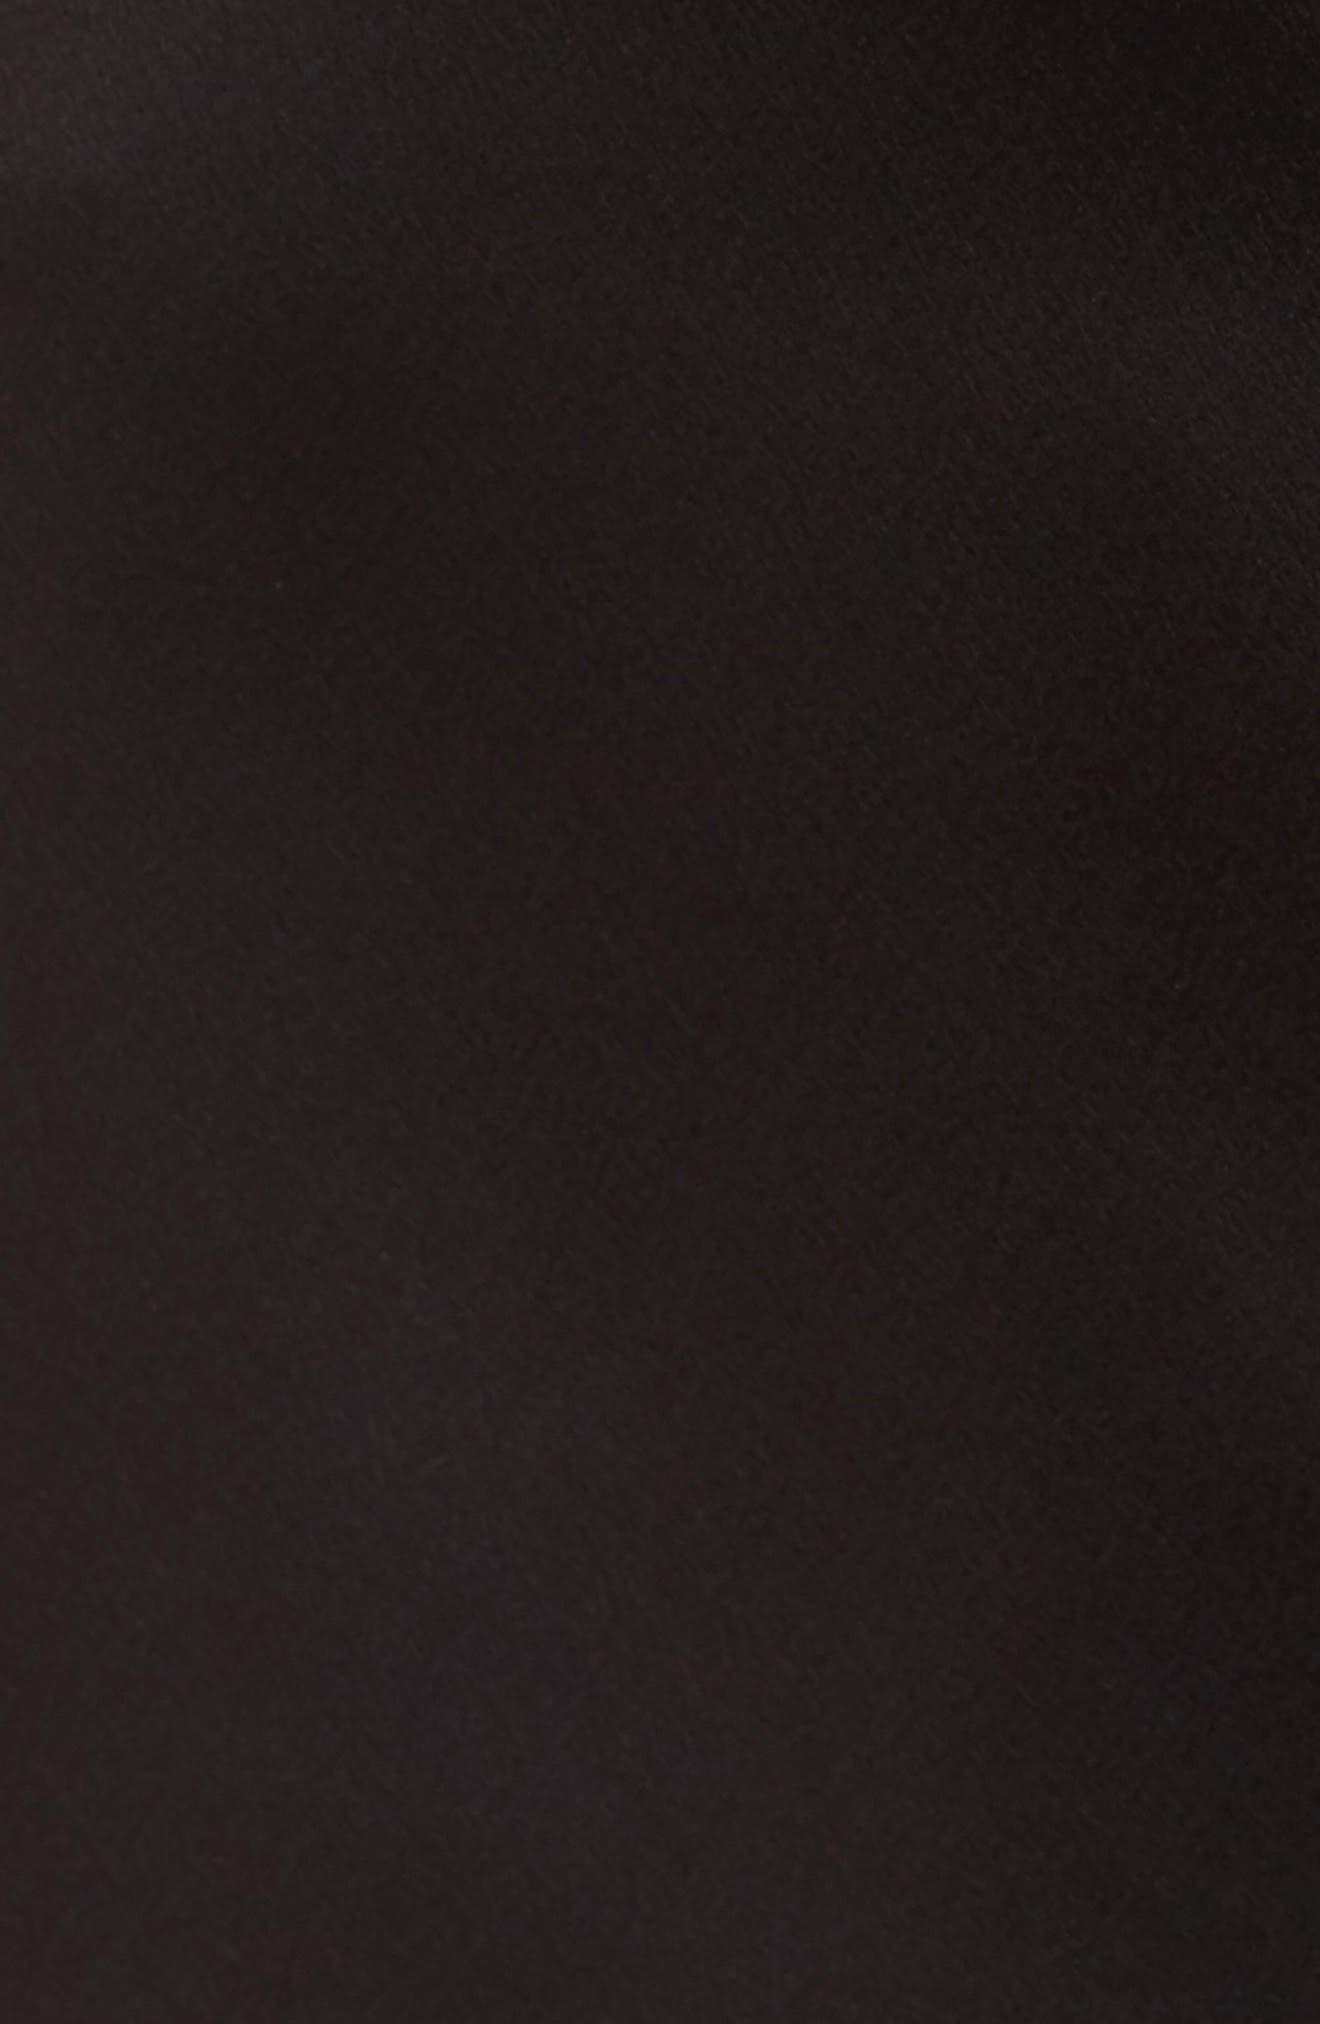 Showstopper Robe,                             Alternate thumbnail 6, color,                             BLACK